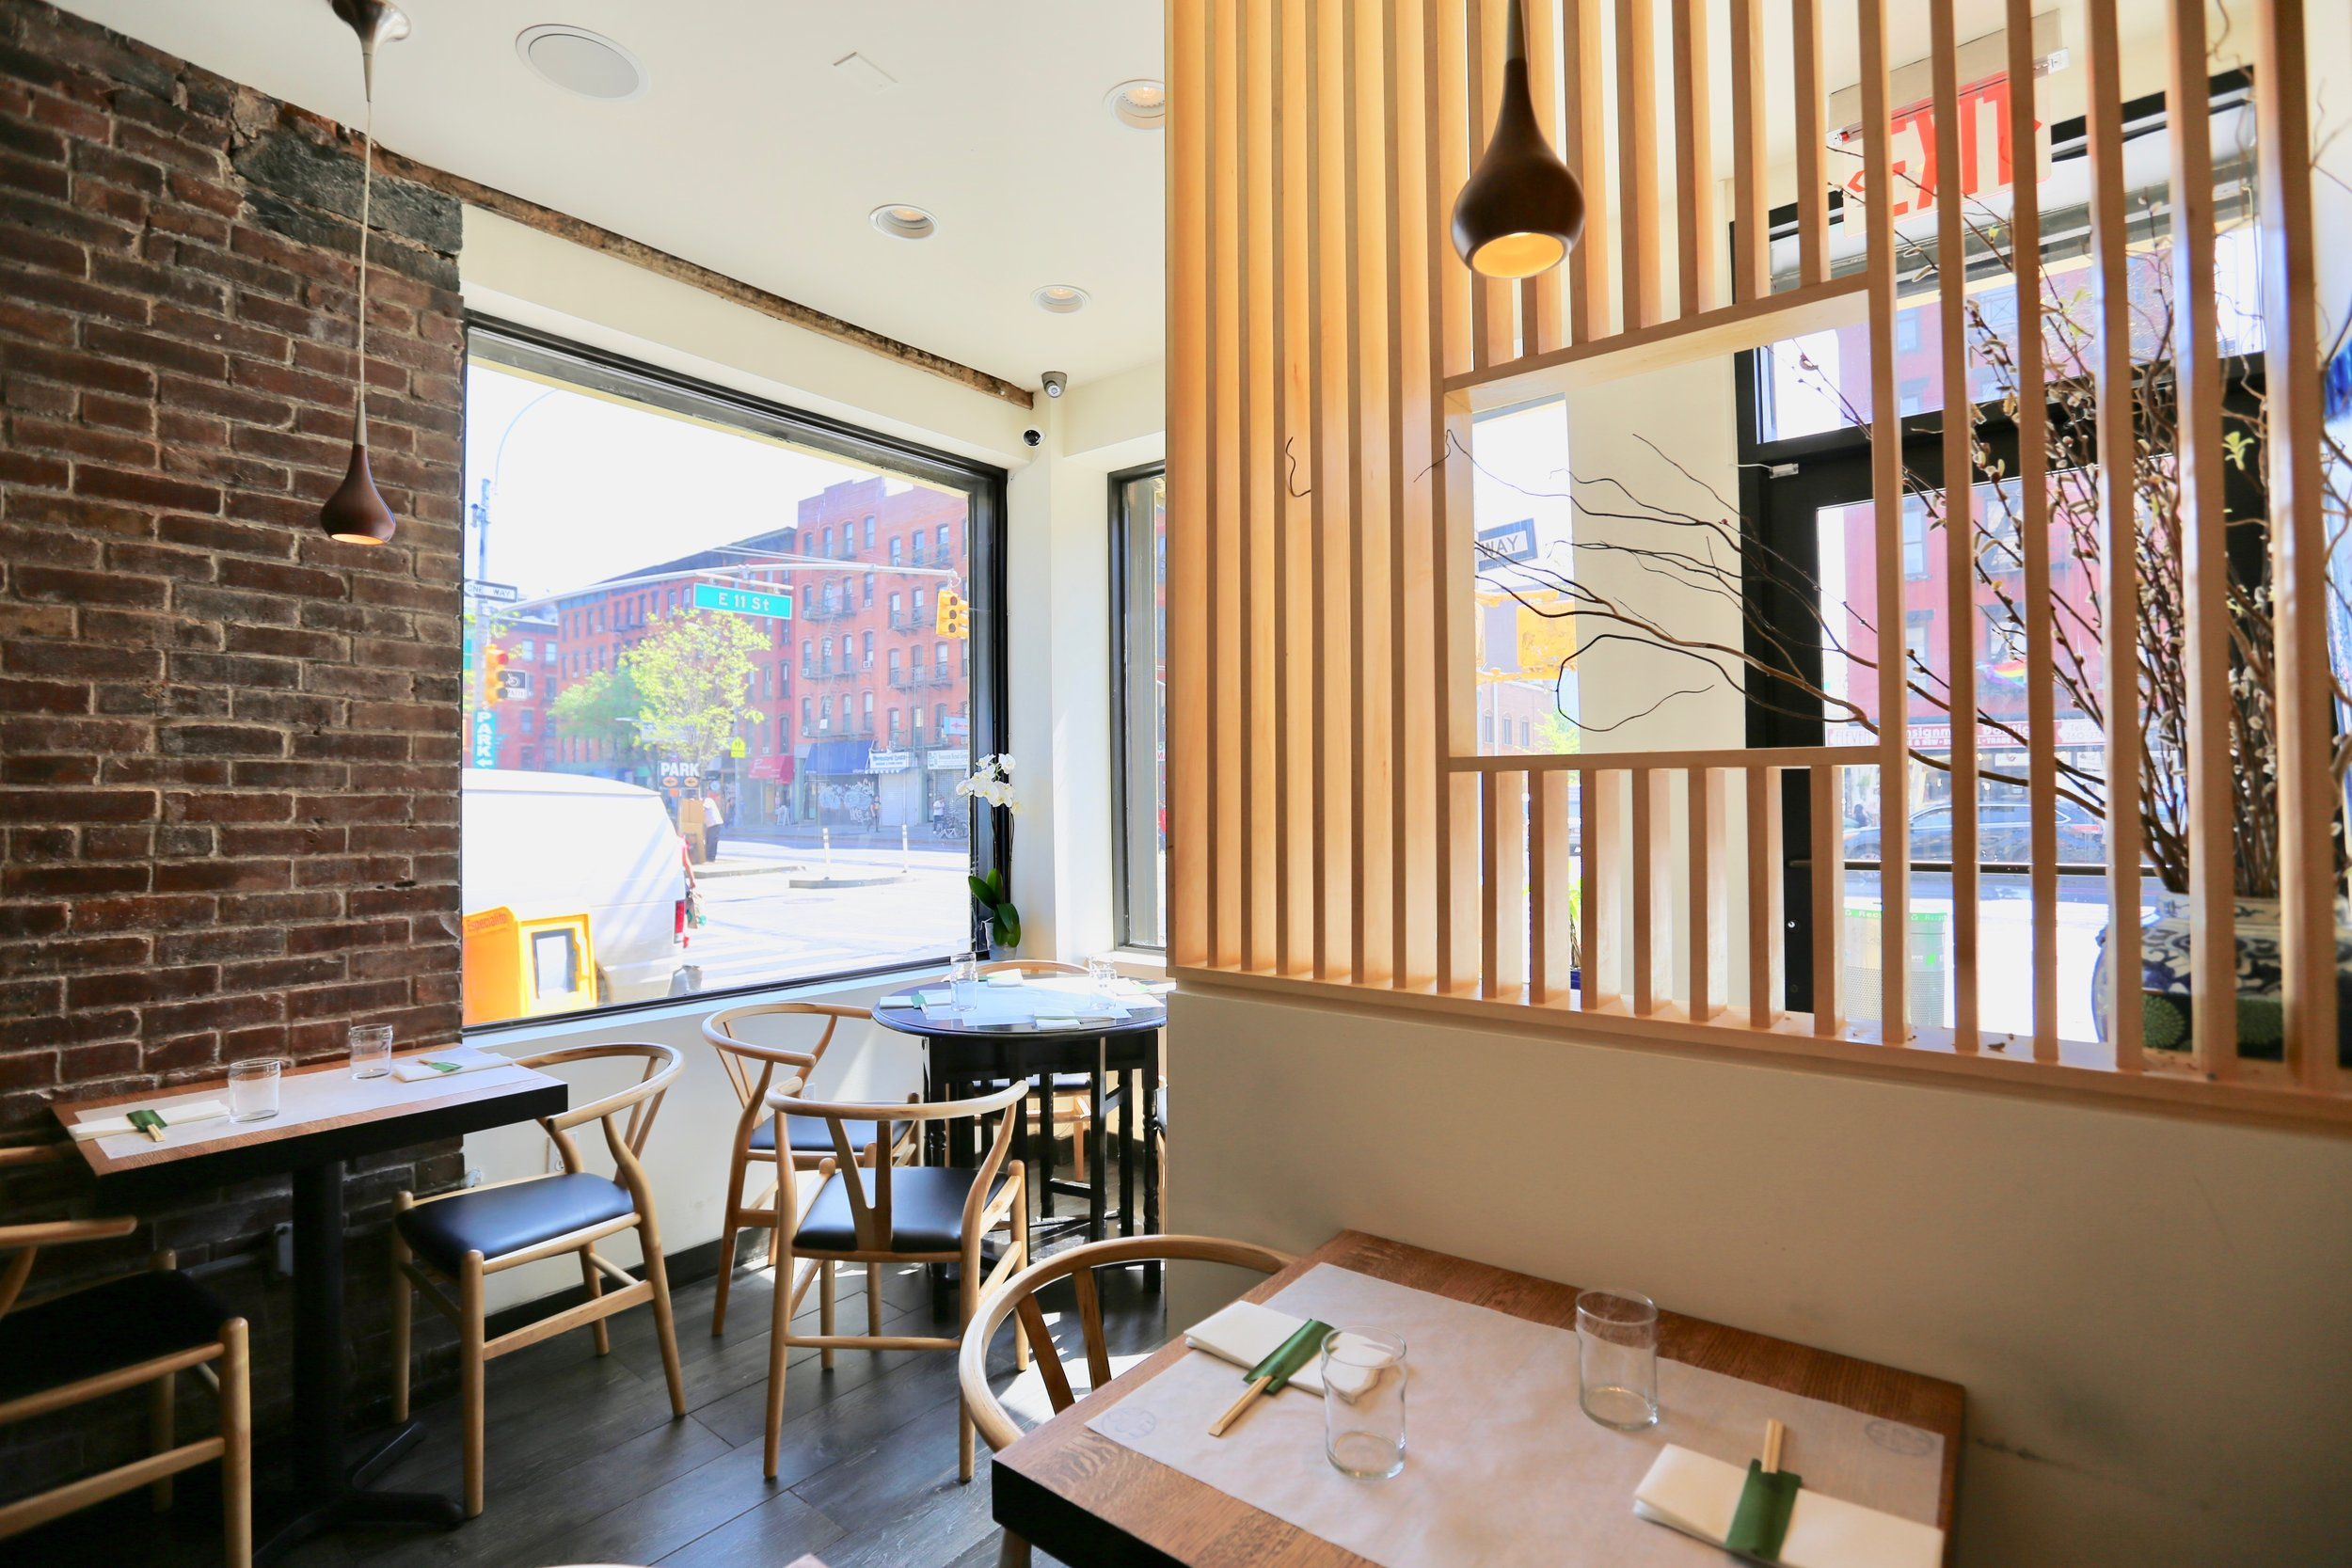 little tong noodle shop interior 1.jpg